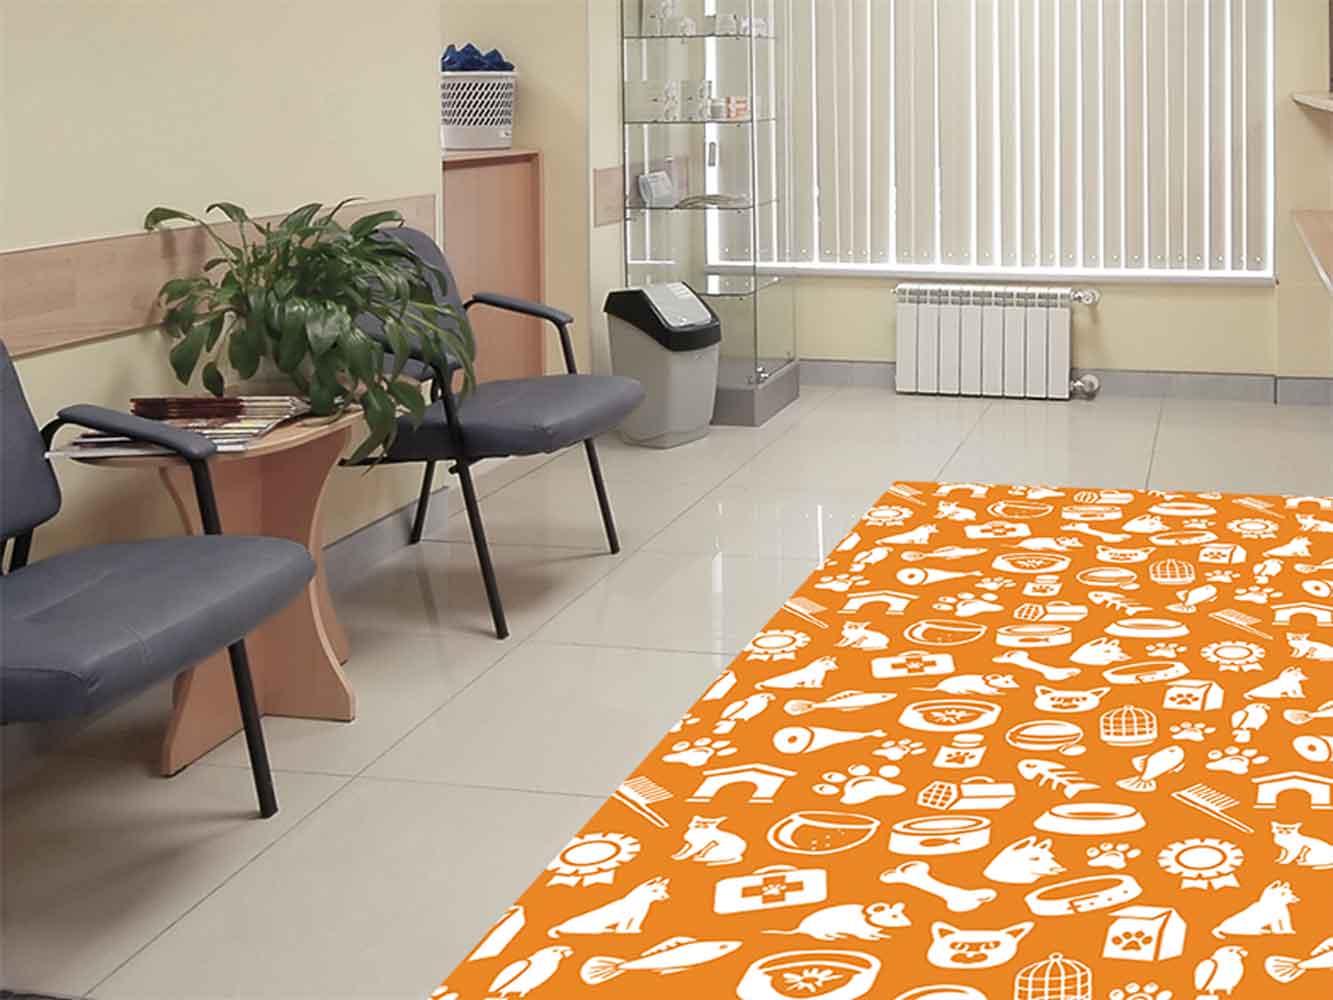 Alfombra PVC Veterinaria Animales Naranja | Carteles XXL - Impresión carteleria publicitaria